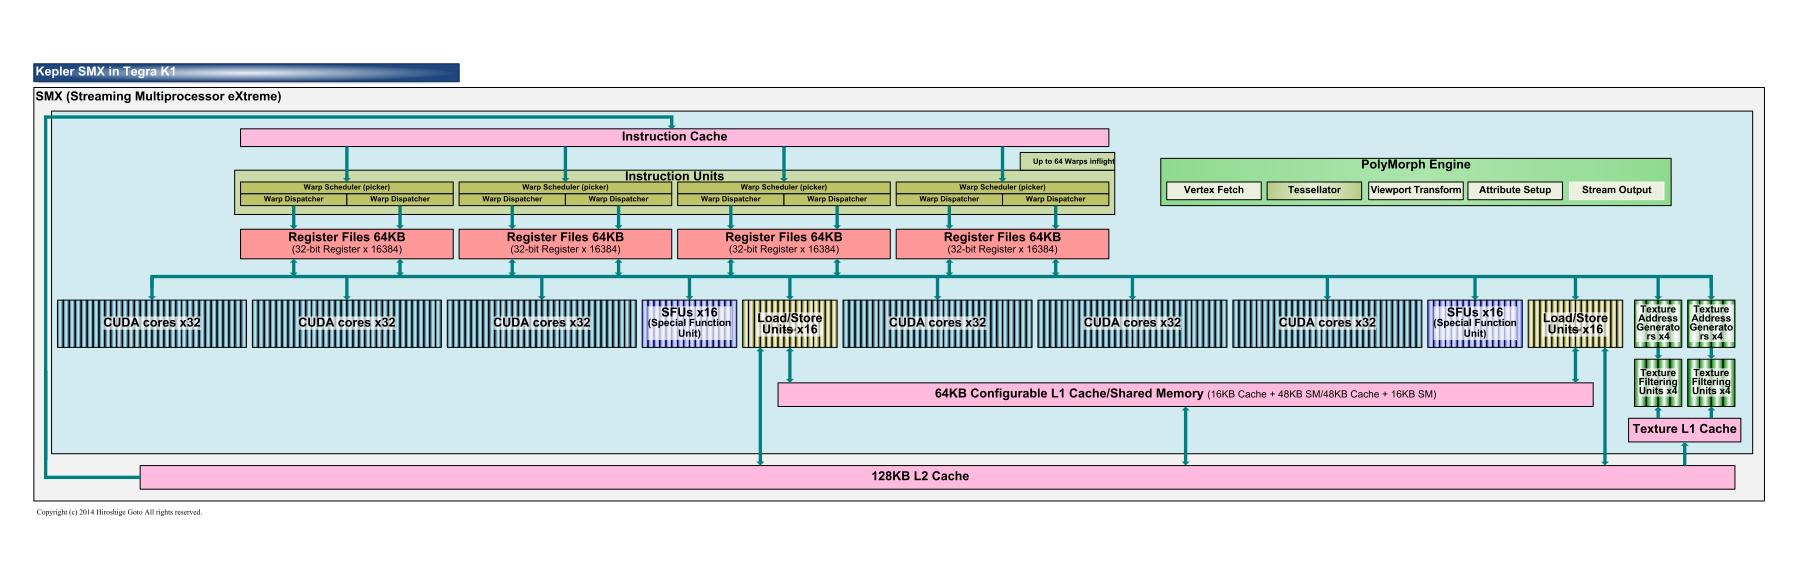 "Tegra K1に搭載されたKepler GPUコアのSM(PDF版は<span class=""img-inline raw""><a href=""/video/pcw/docs/683/434/p07.pdf"" ipw_status=""1"" ipw_linktype=""filelink_raw"" class=""resource"">こちら</a></span>)"